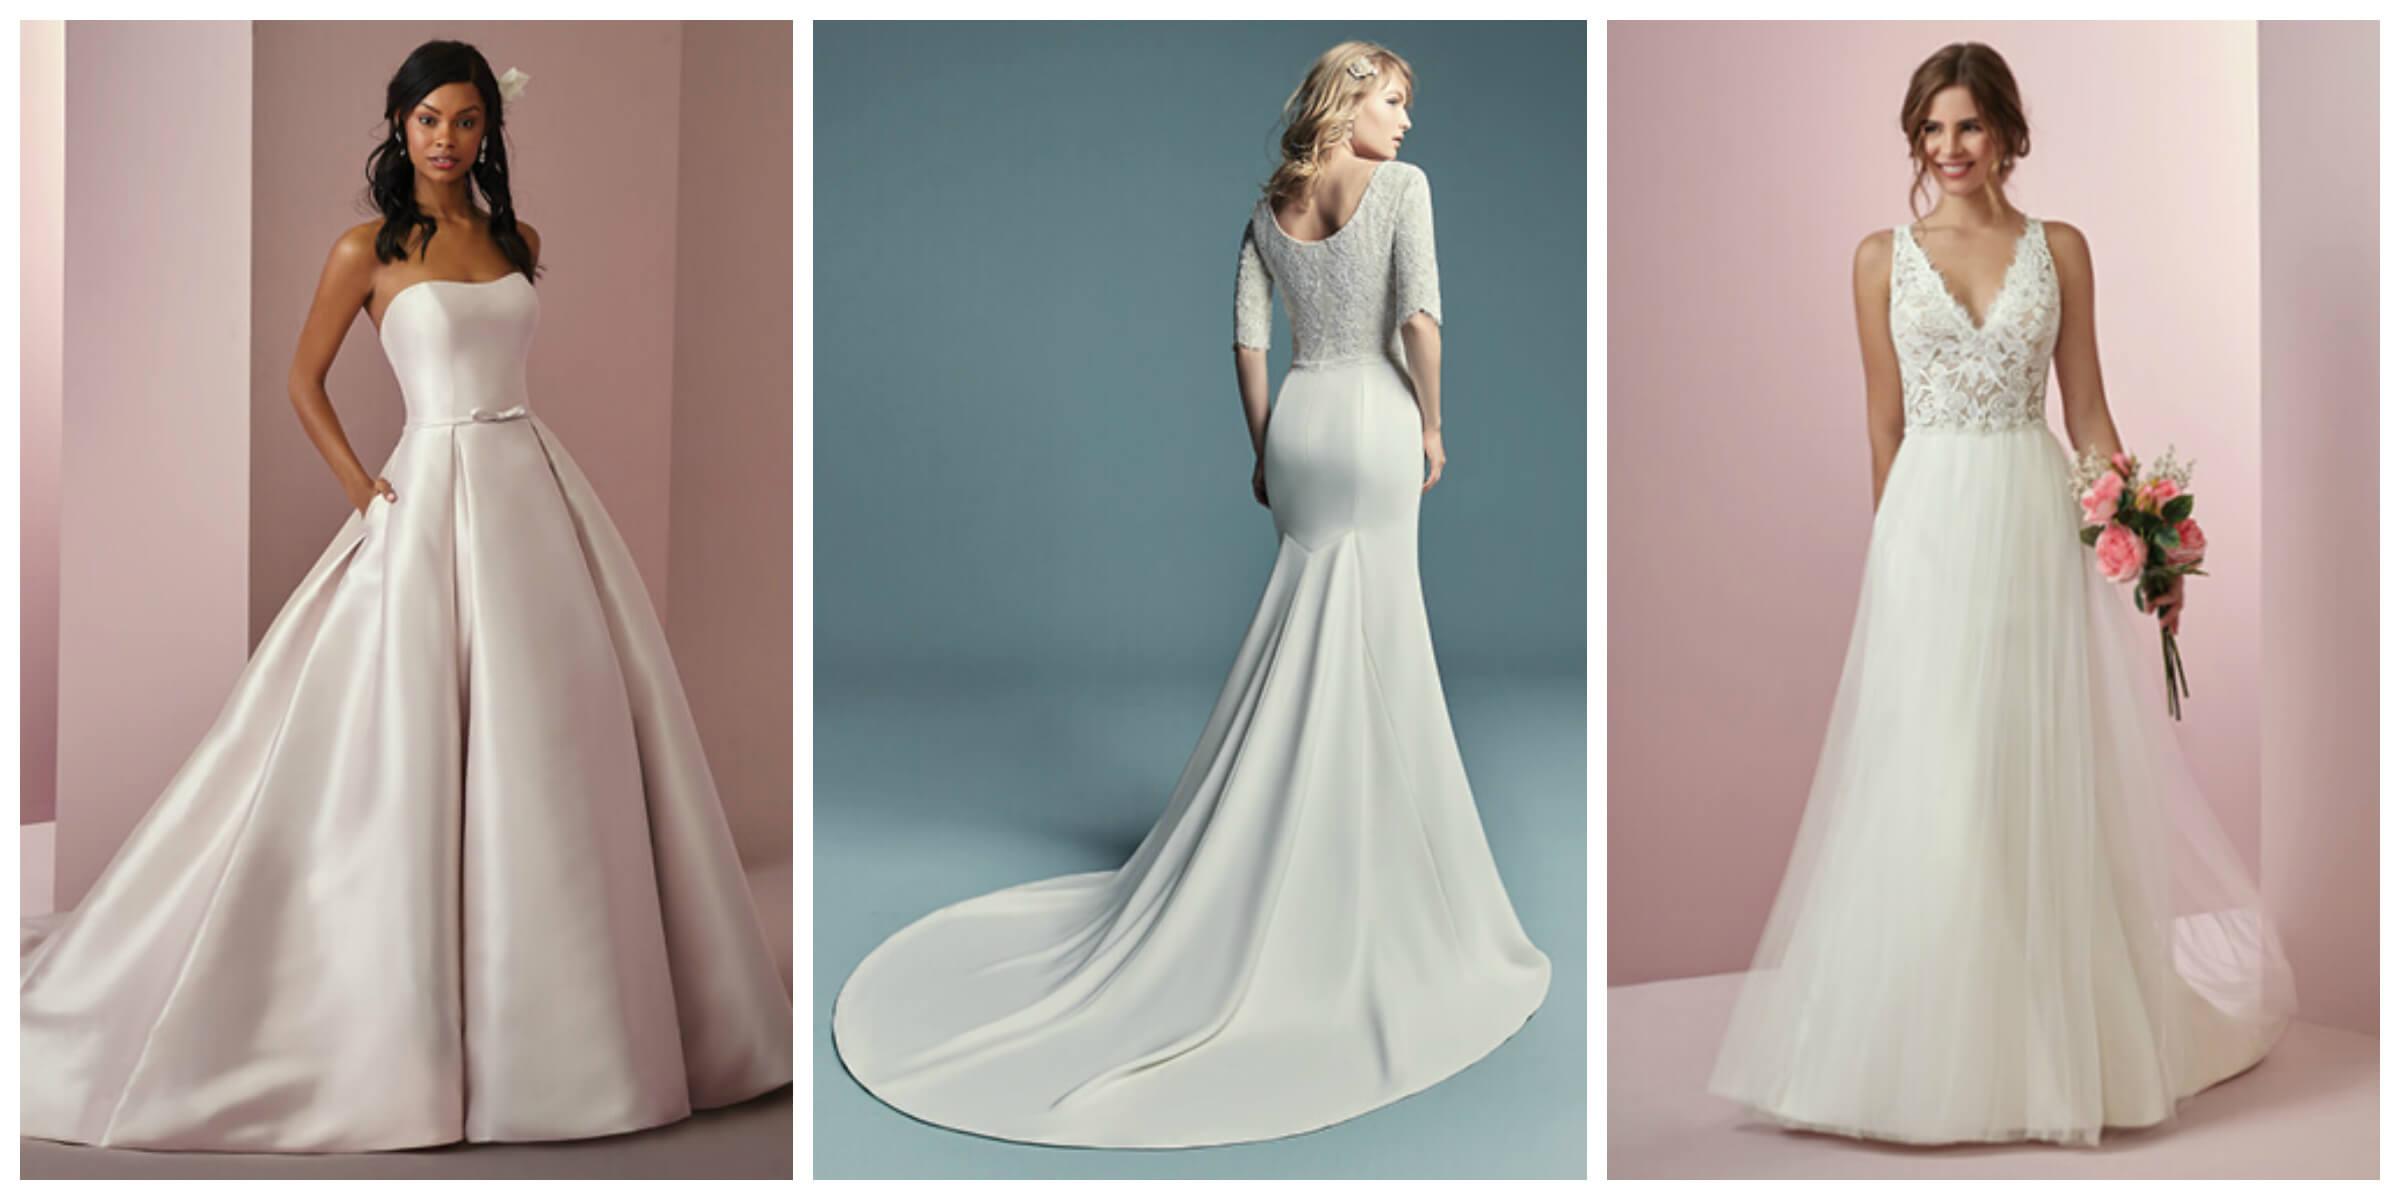 Choosing A Wedding Dress For Your Body Shape - Bridal & Tuxedo